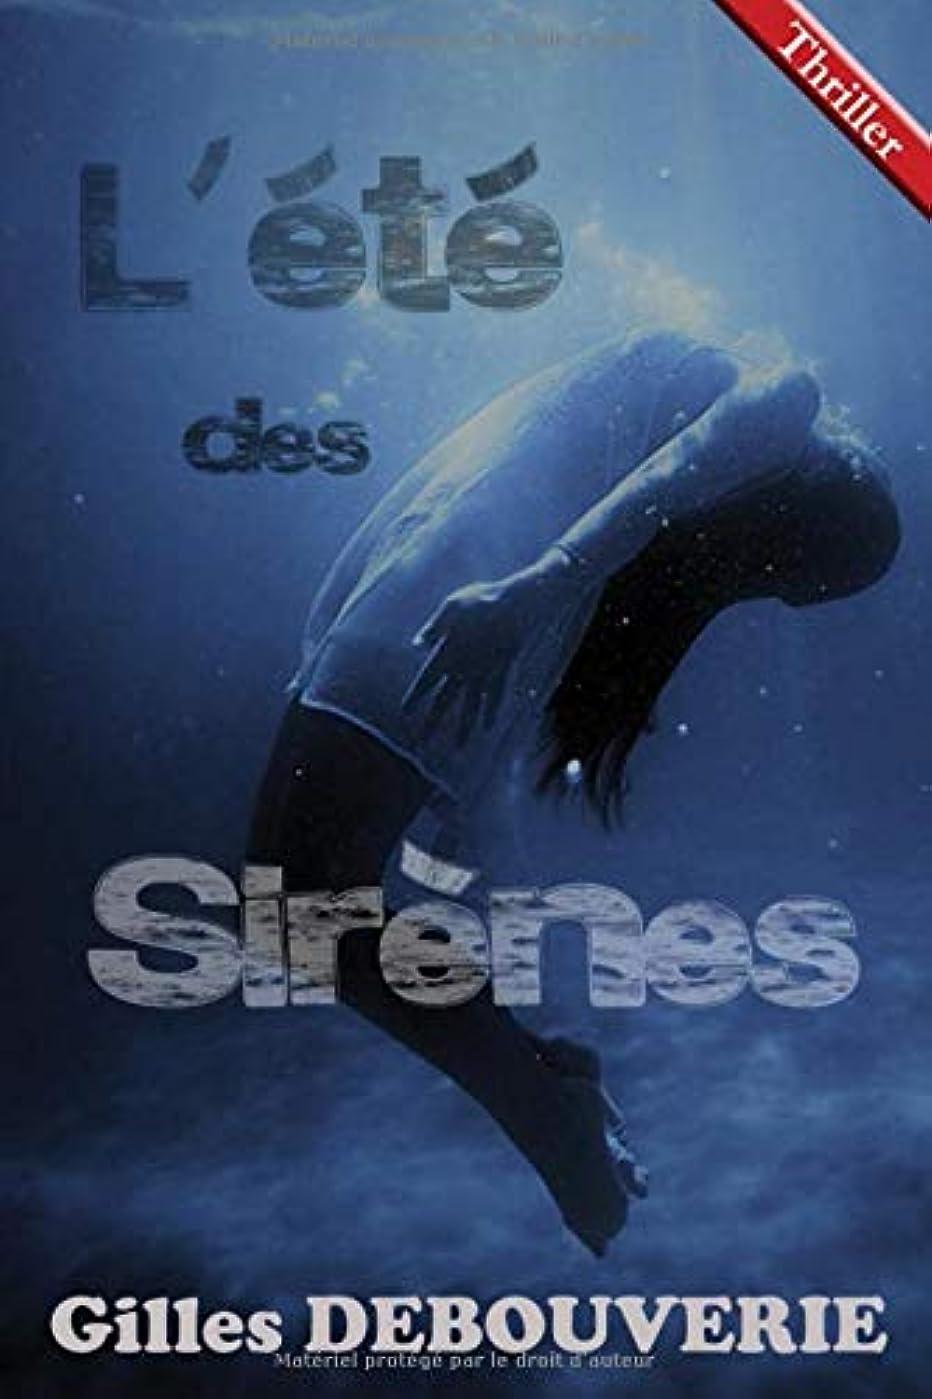 類似性位置づけるL'été des sirènes